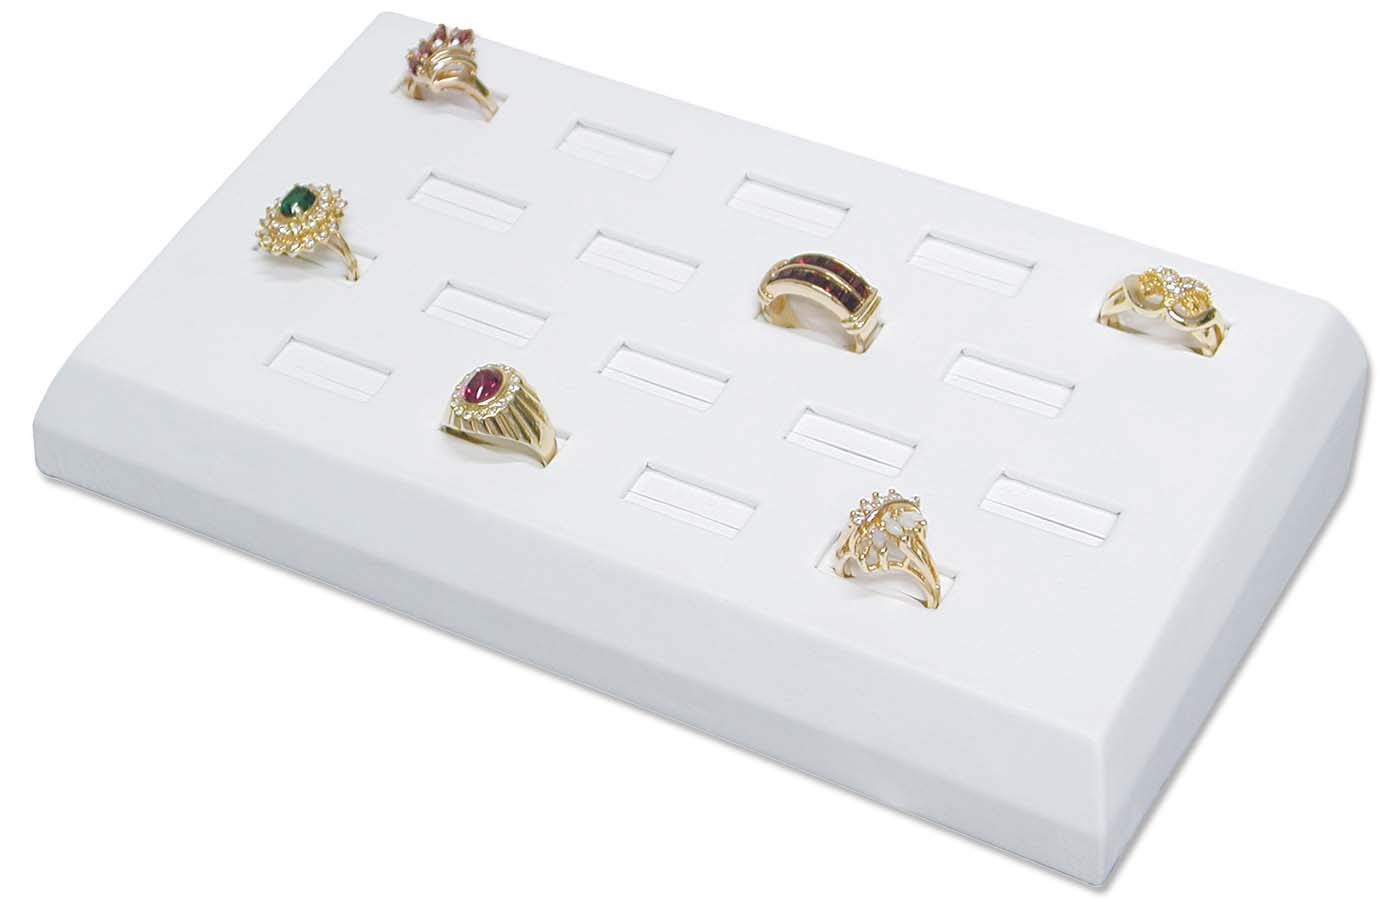 White Ring Tray Jewelry Display